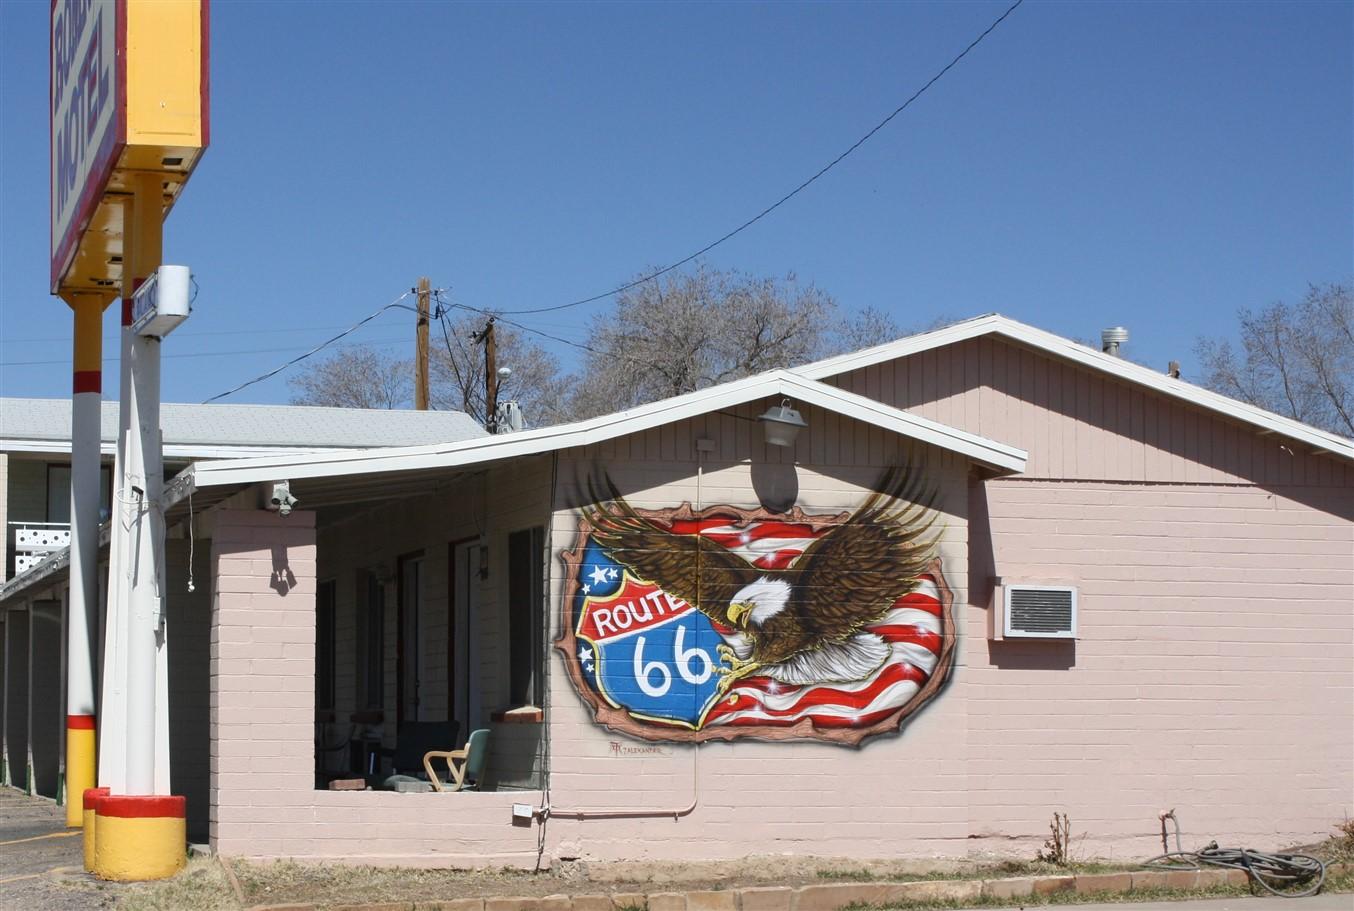 2012 03 14 Route 66 Road Trip 177 Seligman Arizona.jpg